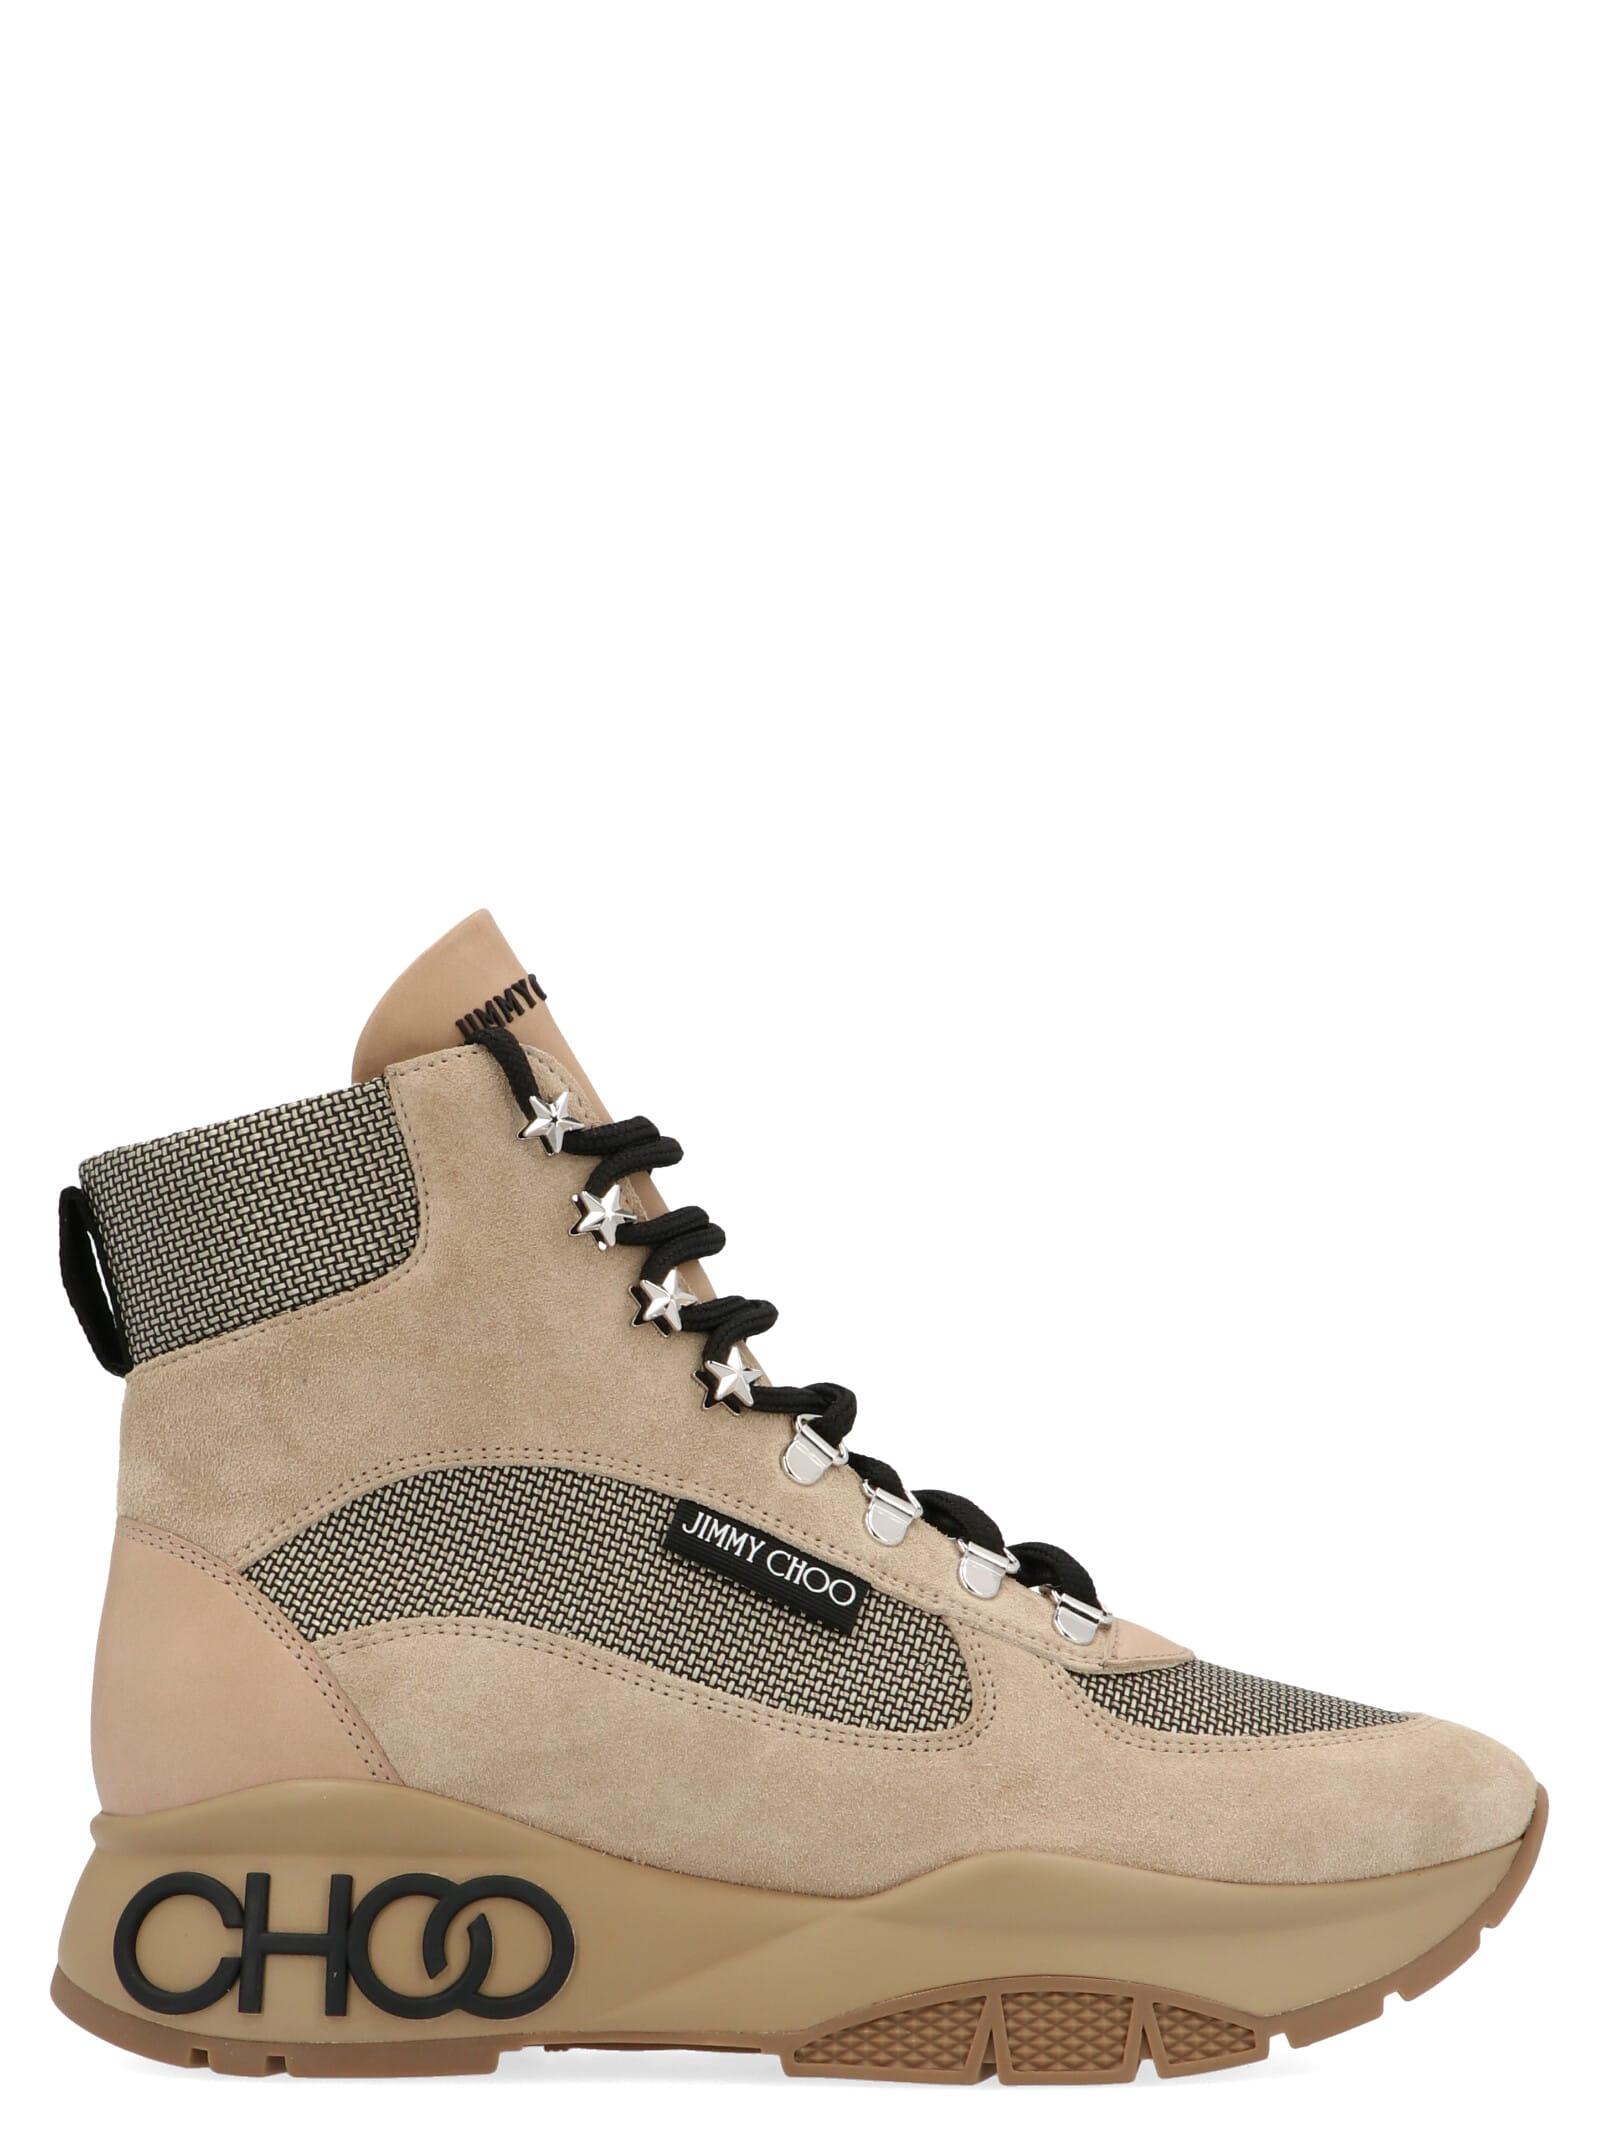 Jimmy Choo Jimmy Choo 'trekking' Shoes